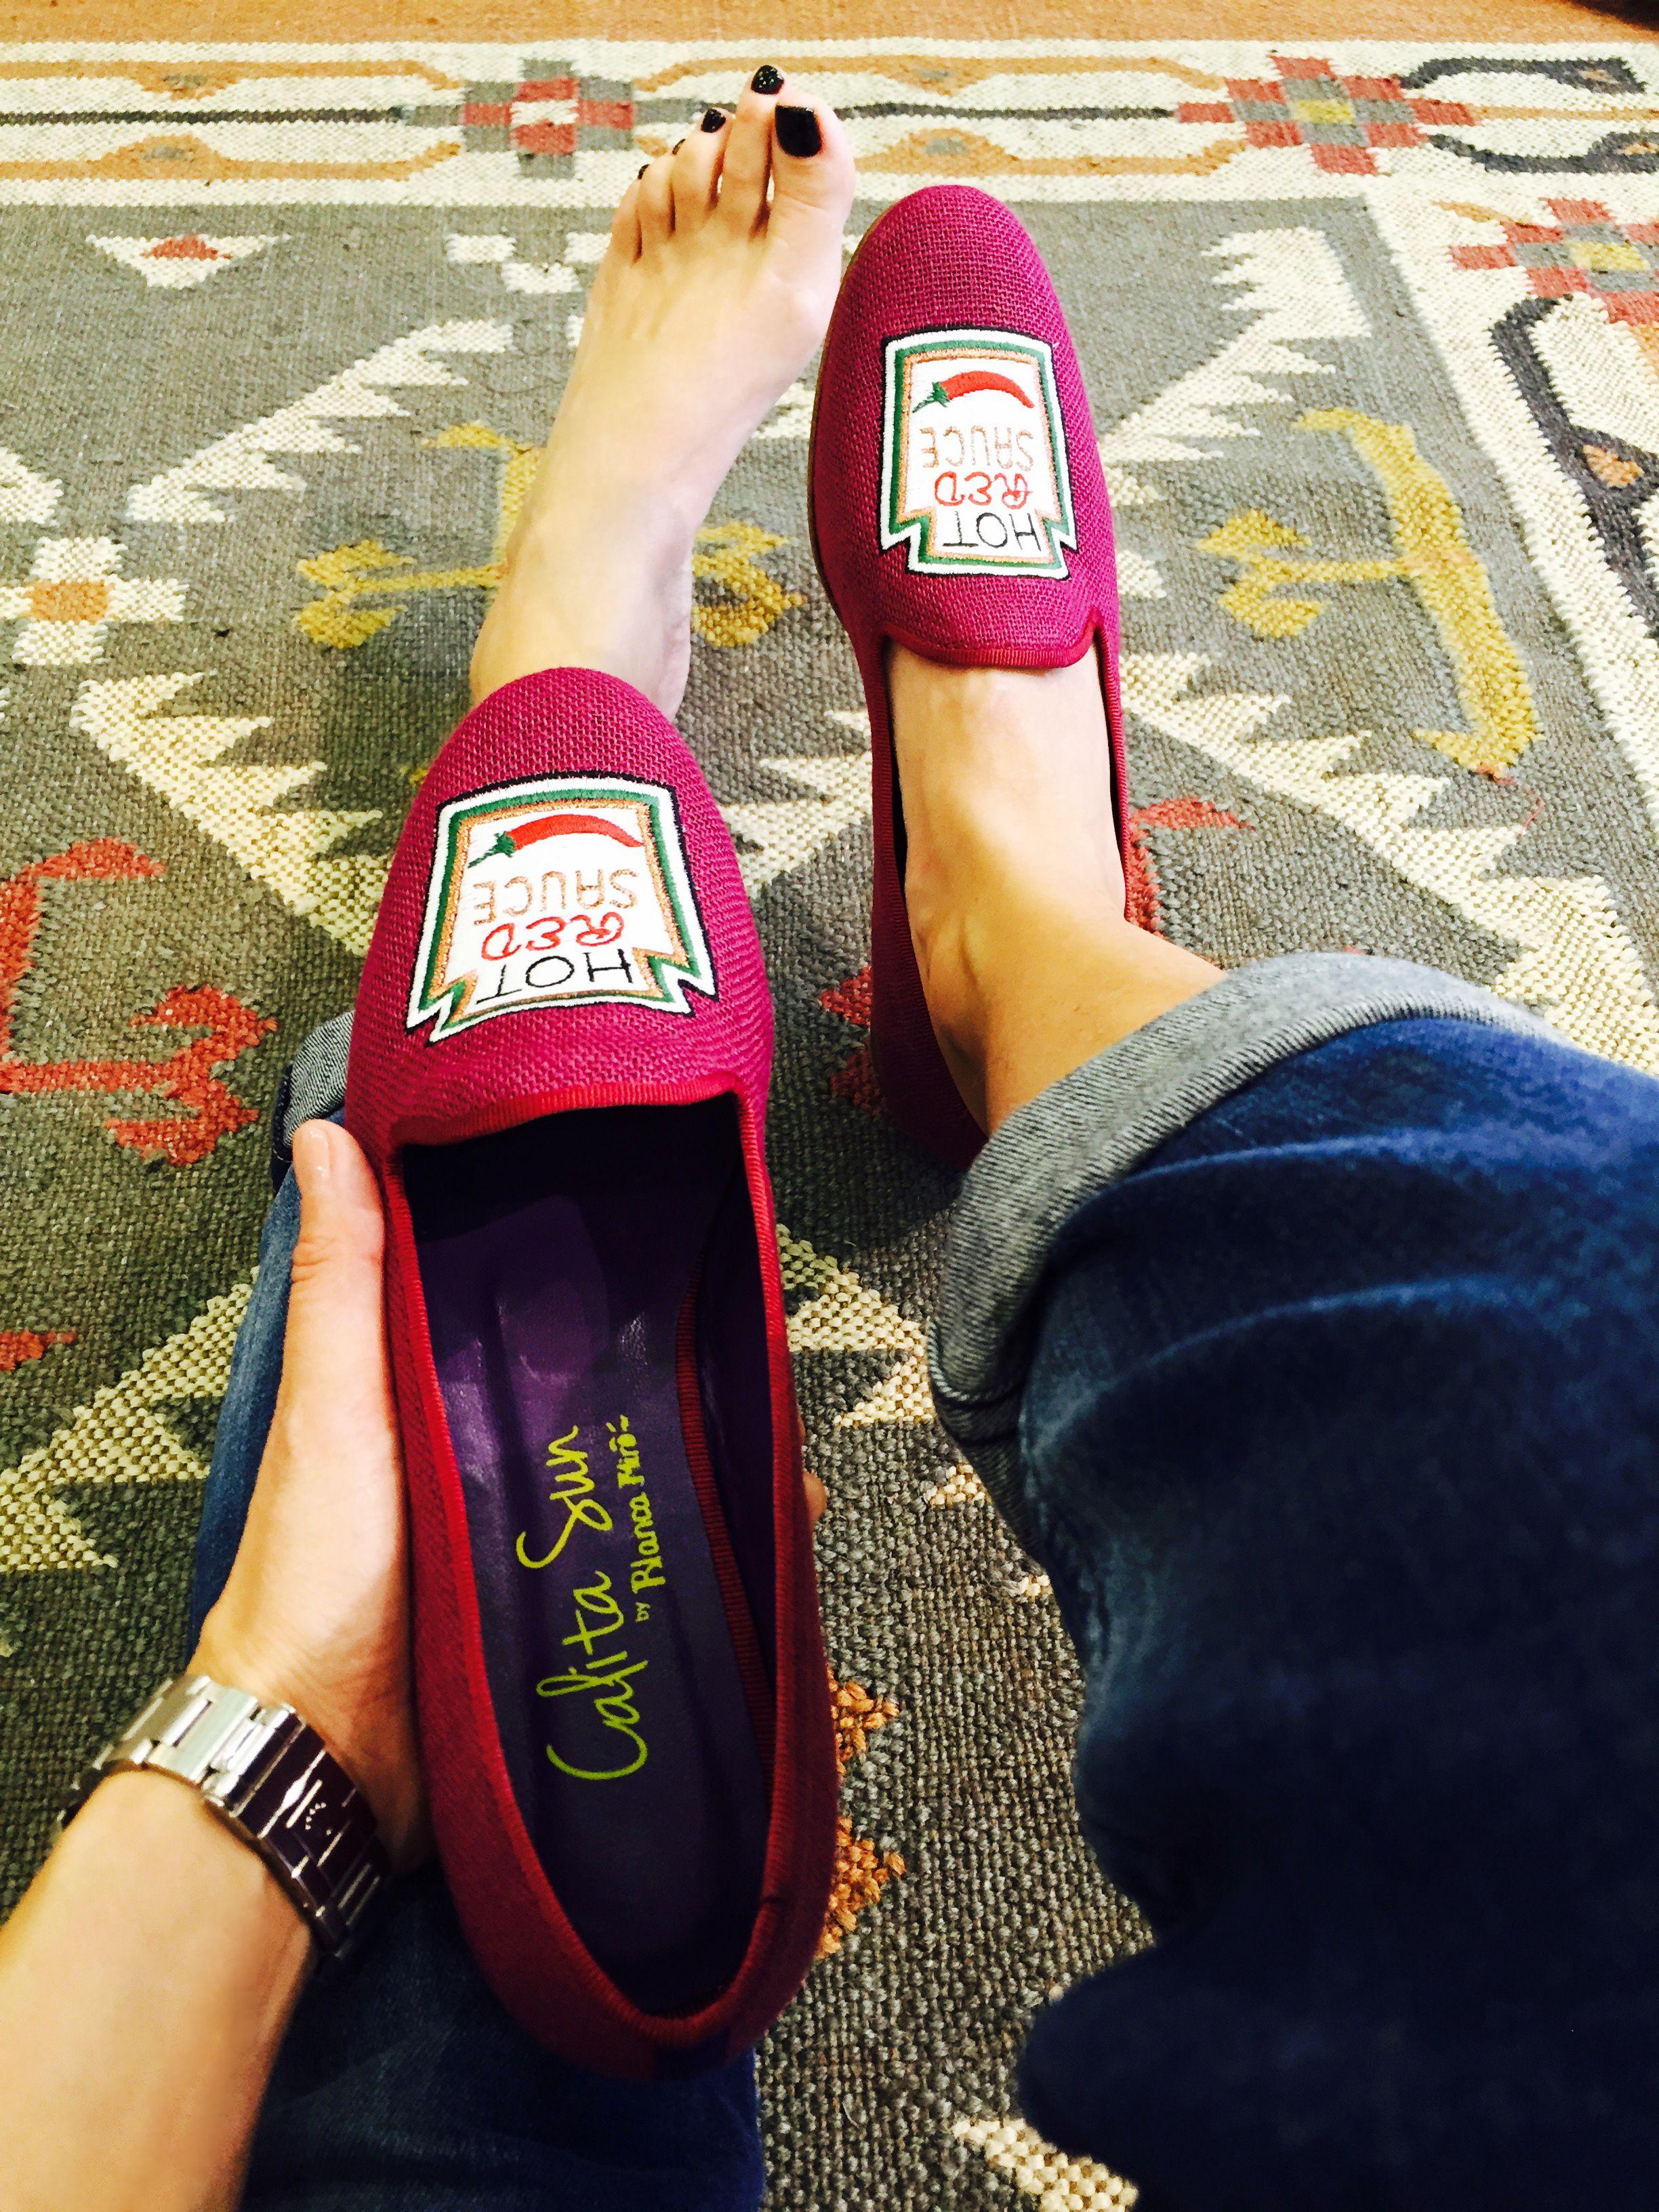 Hot Red Tuesday, Hot Red Sauce #diariodeestilo #ELLEblogs #elle2015 Calita Loafers http://calitashoes.com/ Ayer, en IA MASSANA Av. Diagonal, 626 #Barcelona probándome mis nuevas #calitaloafers #hotredsauce Info: 932009917    http://calitashoes.com/